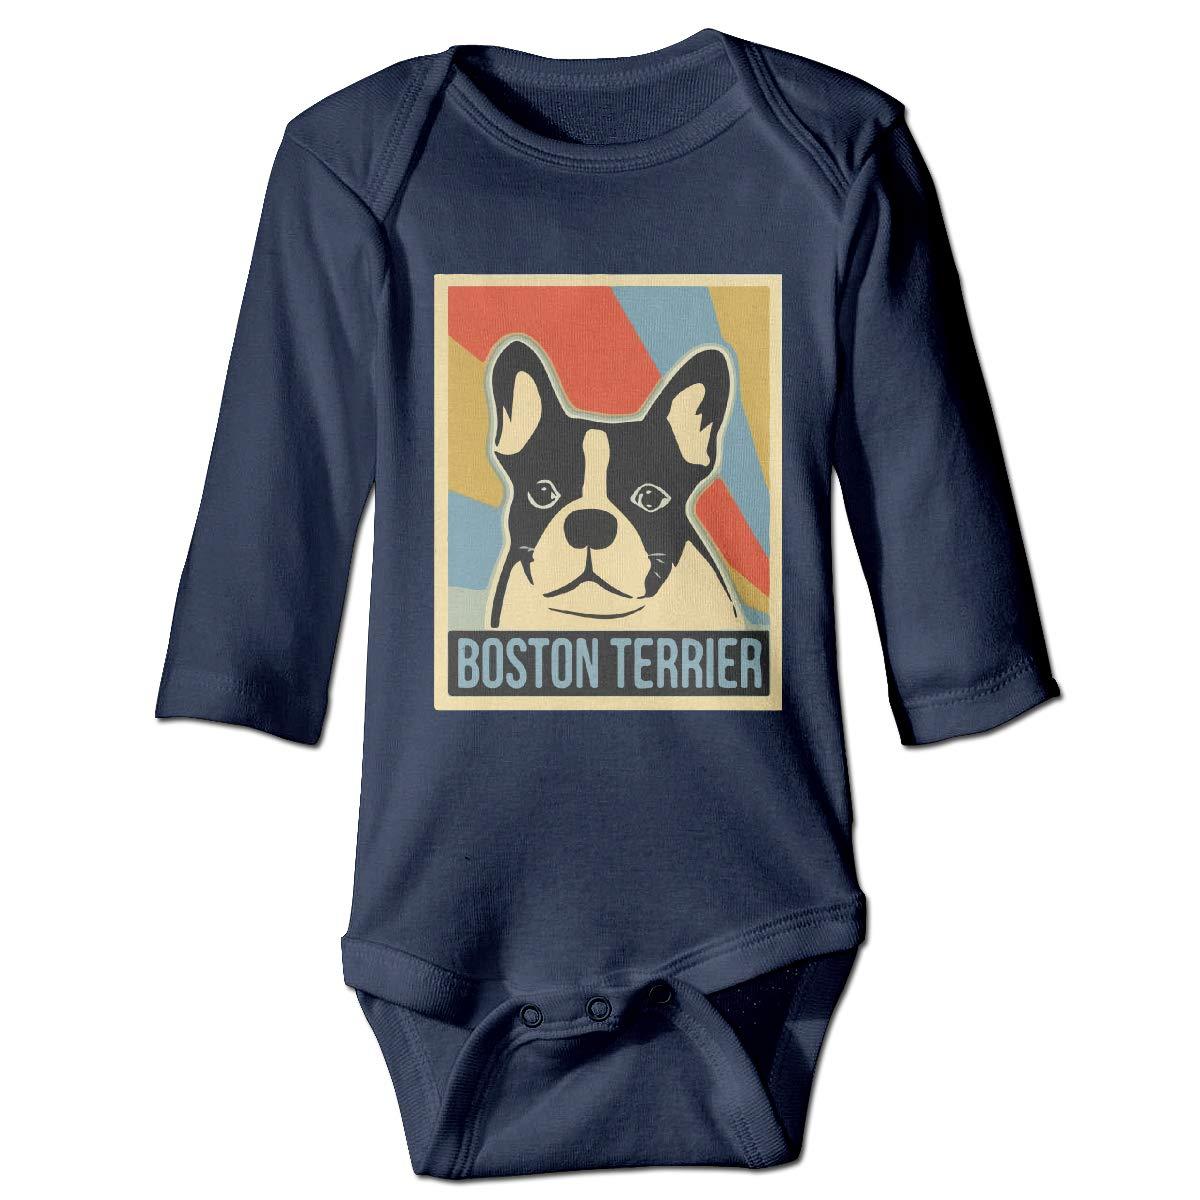 Q98BABY Newborn Baby Boys Girls Long Sleeve Romper Bodysuit Retro Boston Terrier Print Jumpsuit